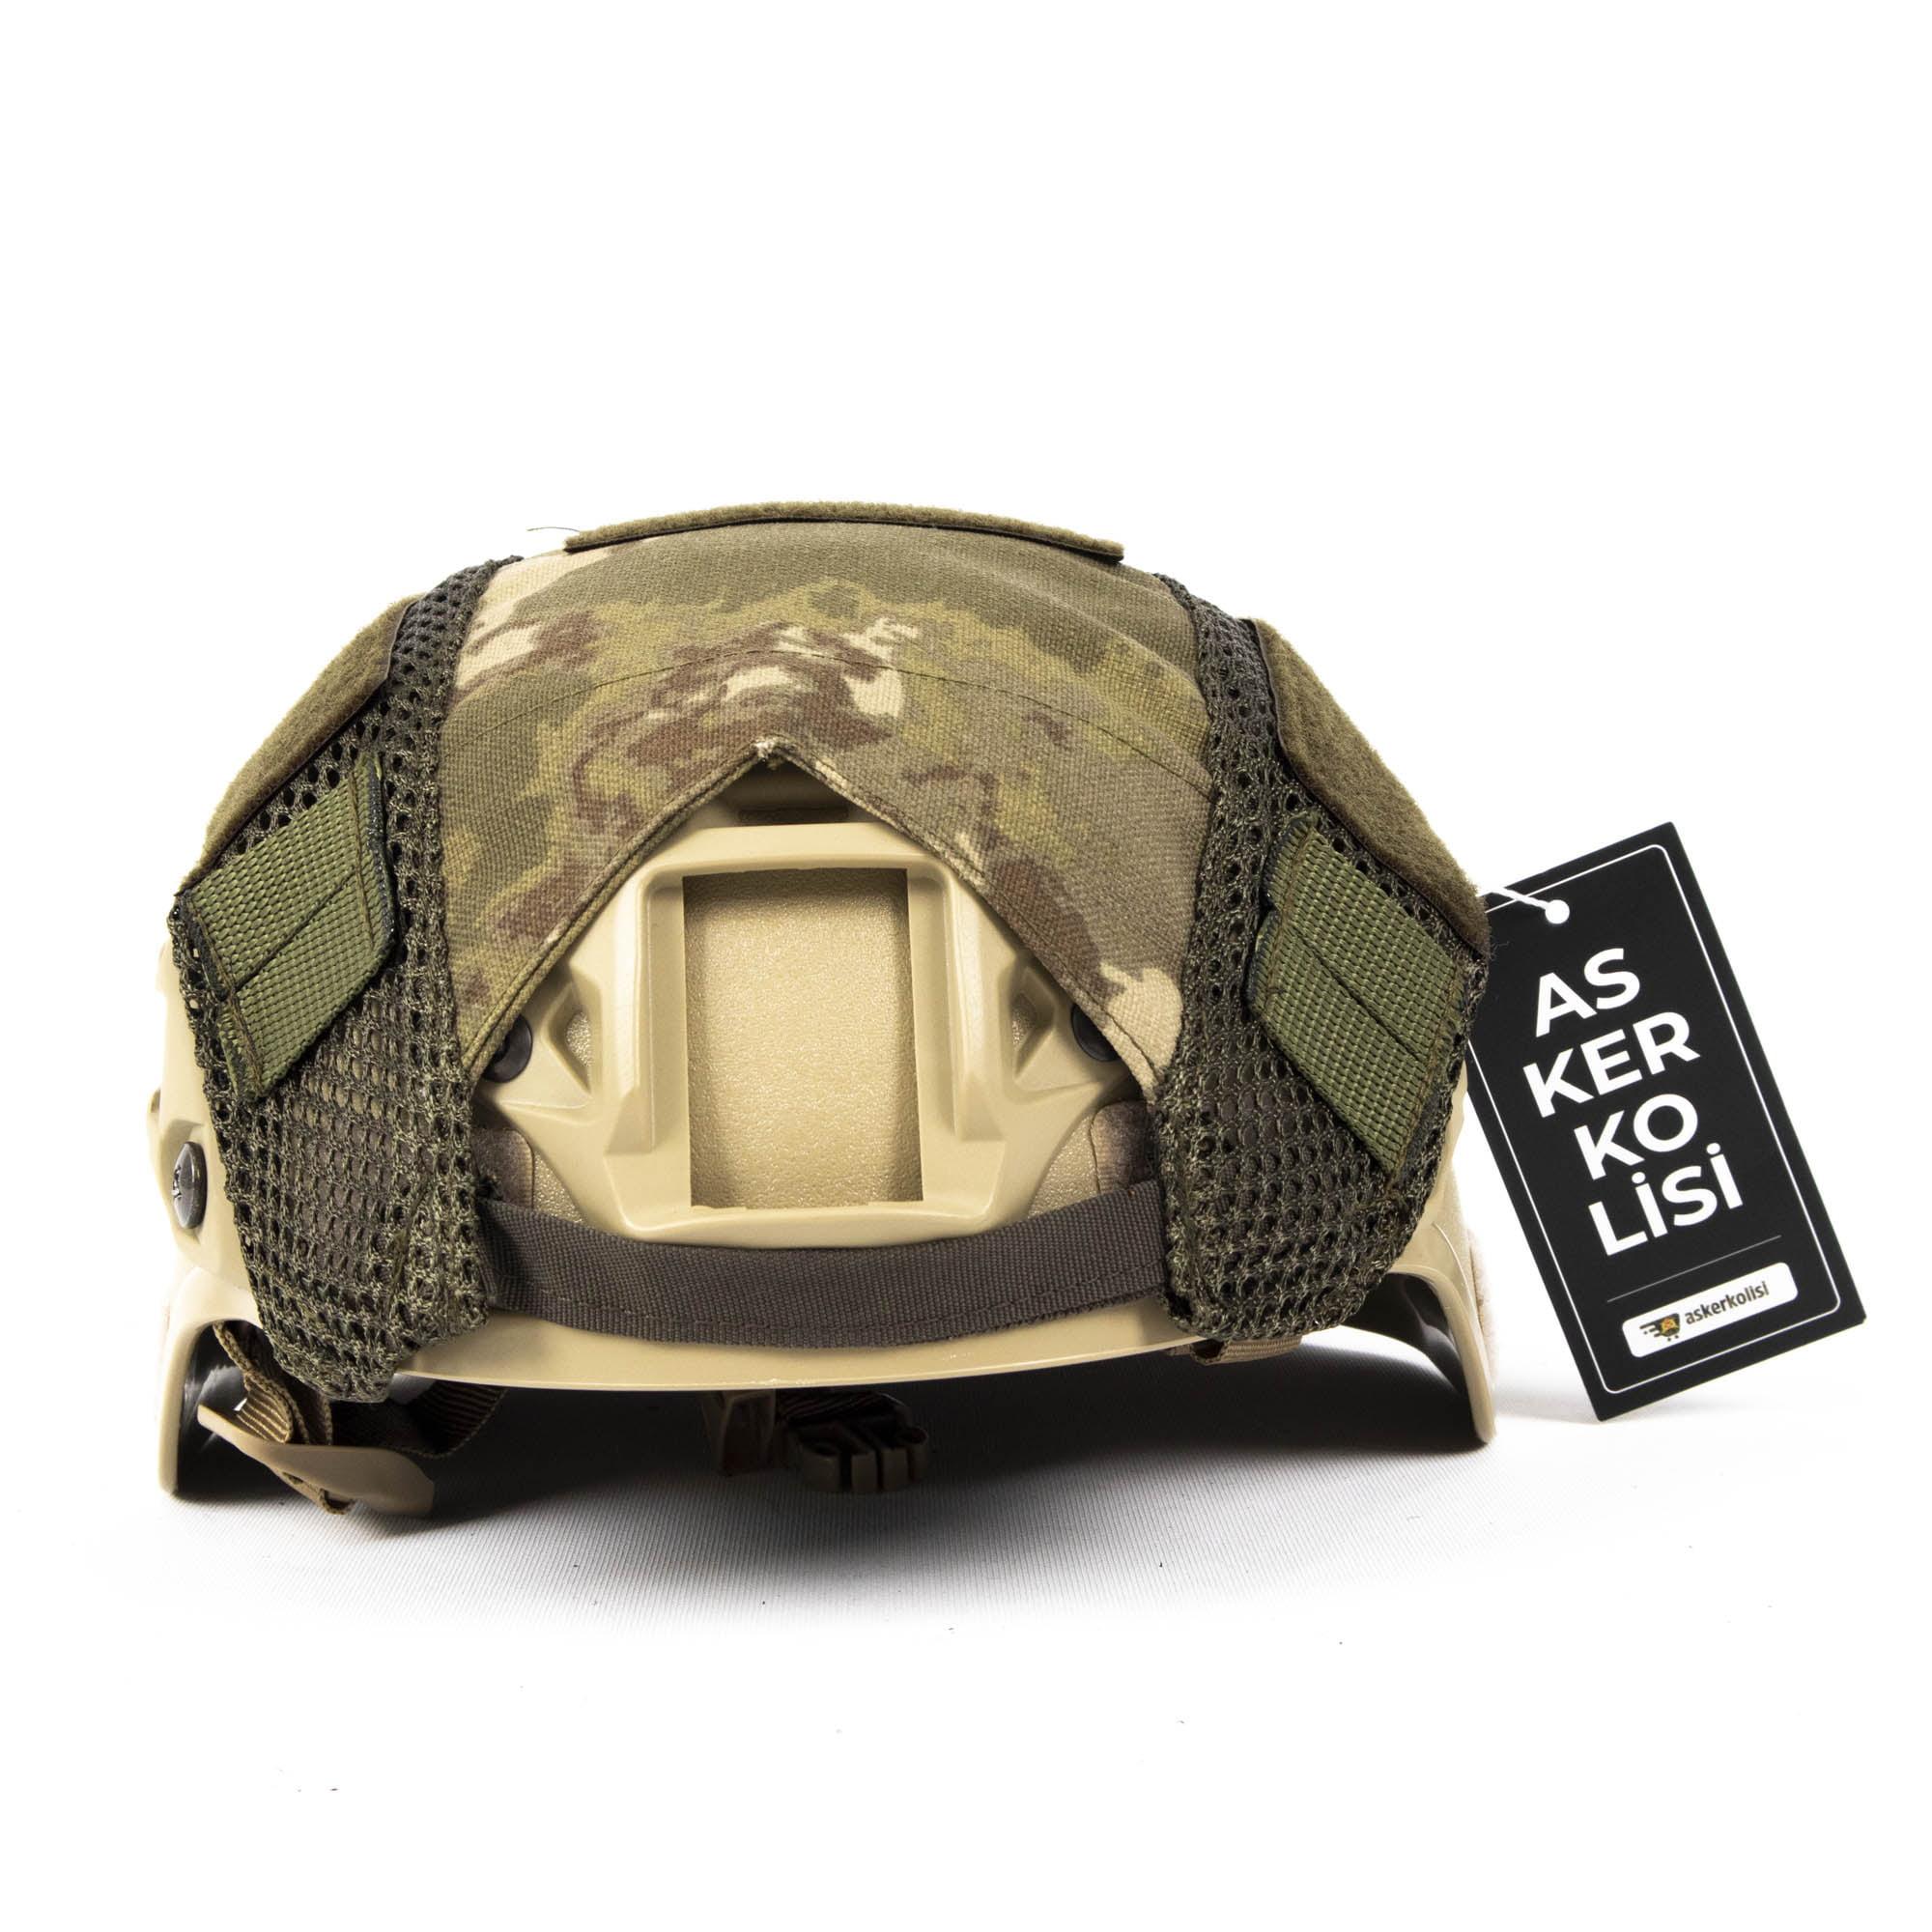 yeni tsk kamuflaj askeri airsoft kask kilifi askeri malzeme